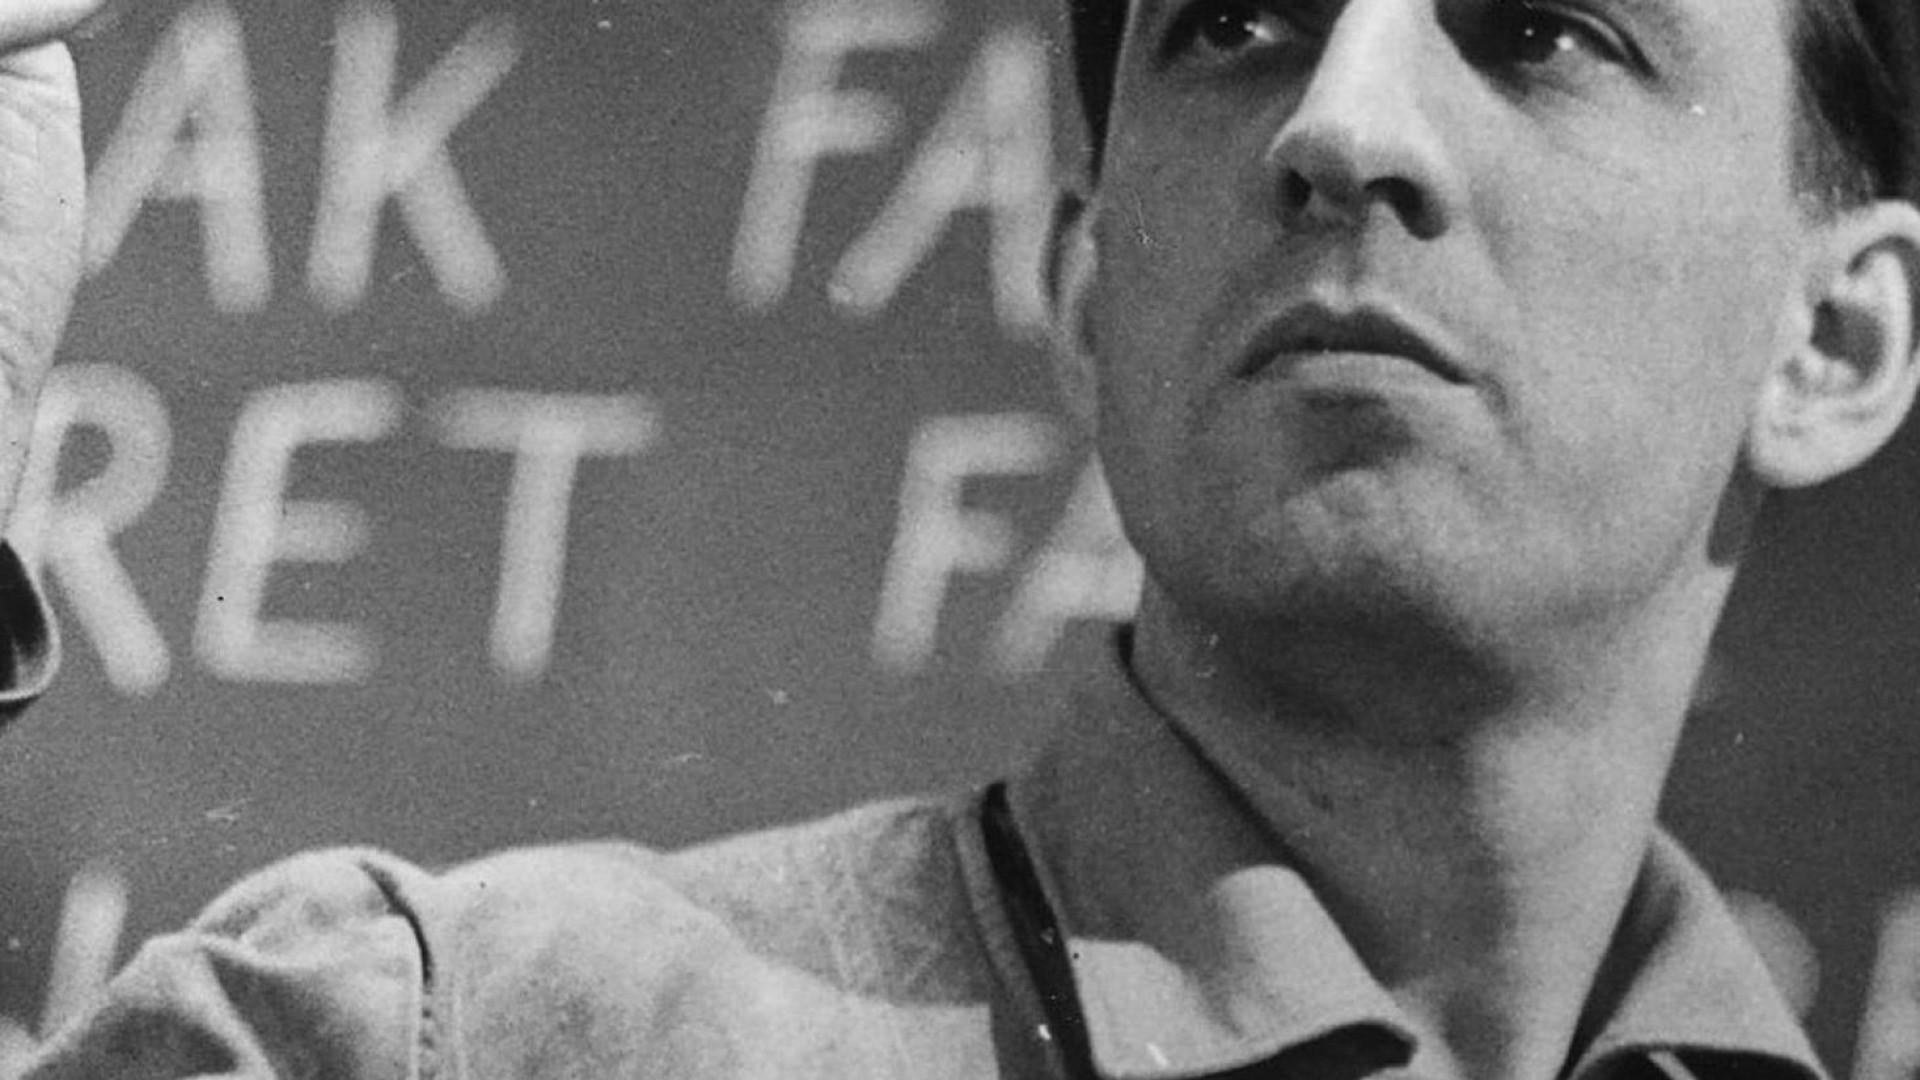 Museu de Lamego dedica ciclo de cinema a Ingmar Bergman